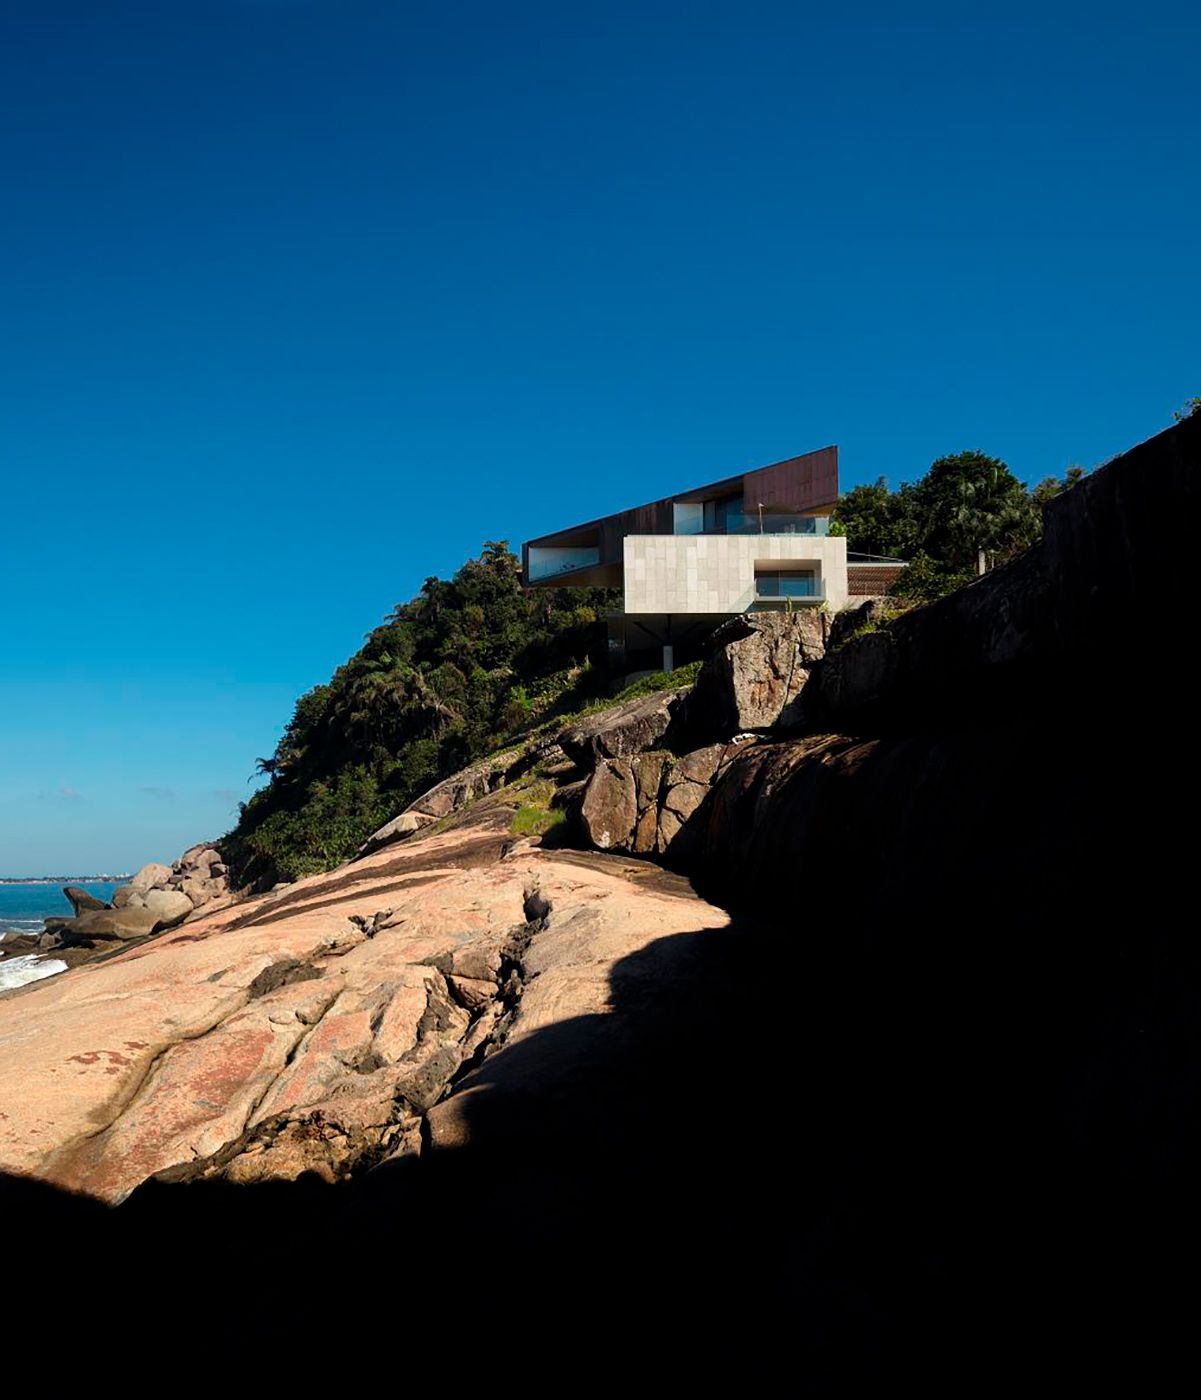 Tropical Modernism A Subversion An Escape And A Global Influence Arquitetura Marcio Kogan